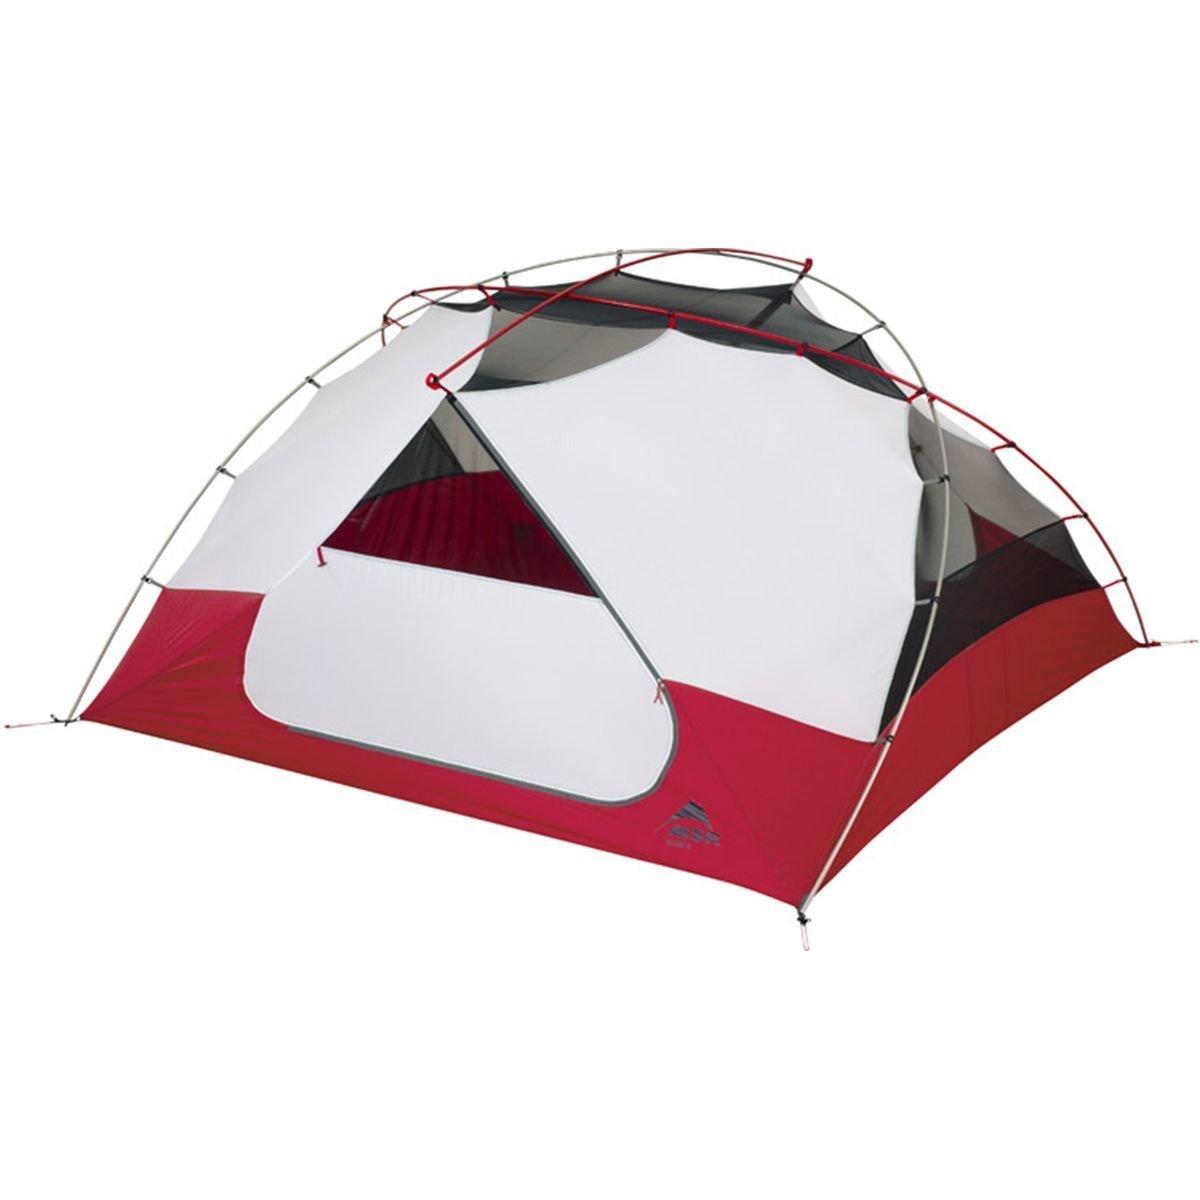 MSR Elixir 4-Person Lightweight Backpacking Tent by MSR (Image #3)